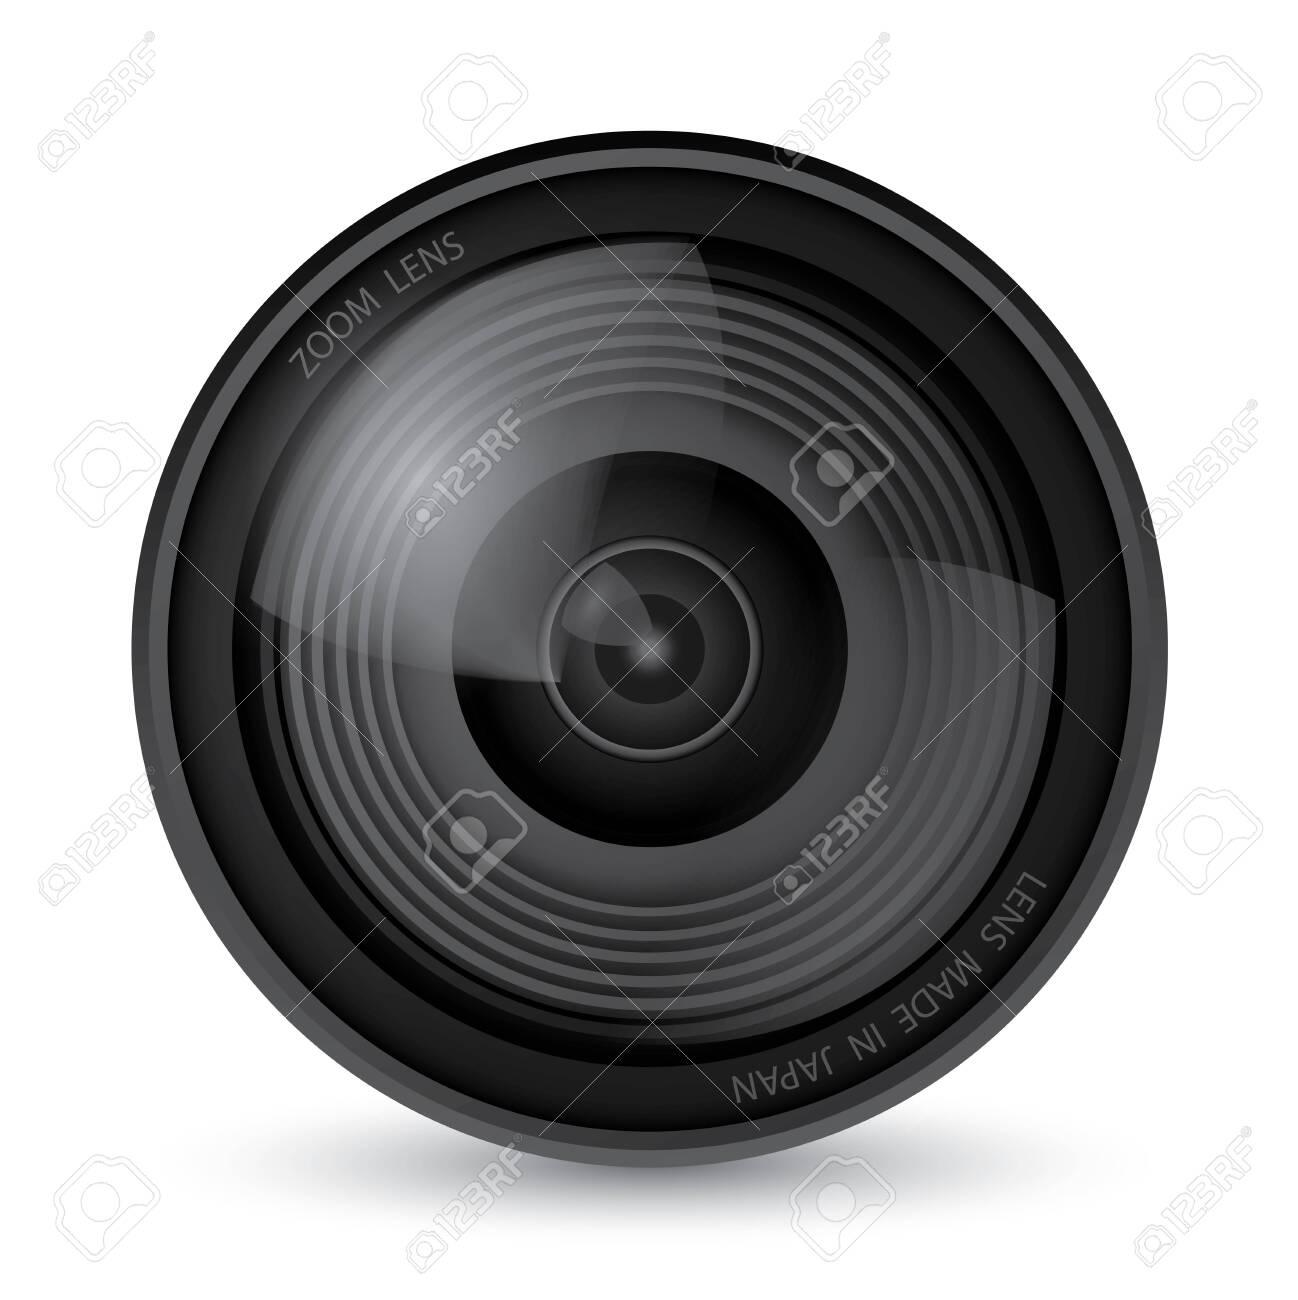 Camera lens over white background, Illustration Vector 10 - 120141031